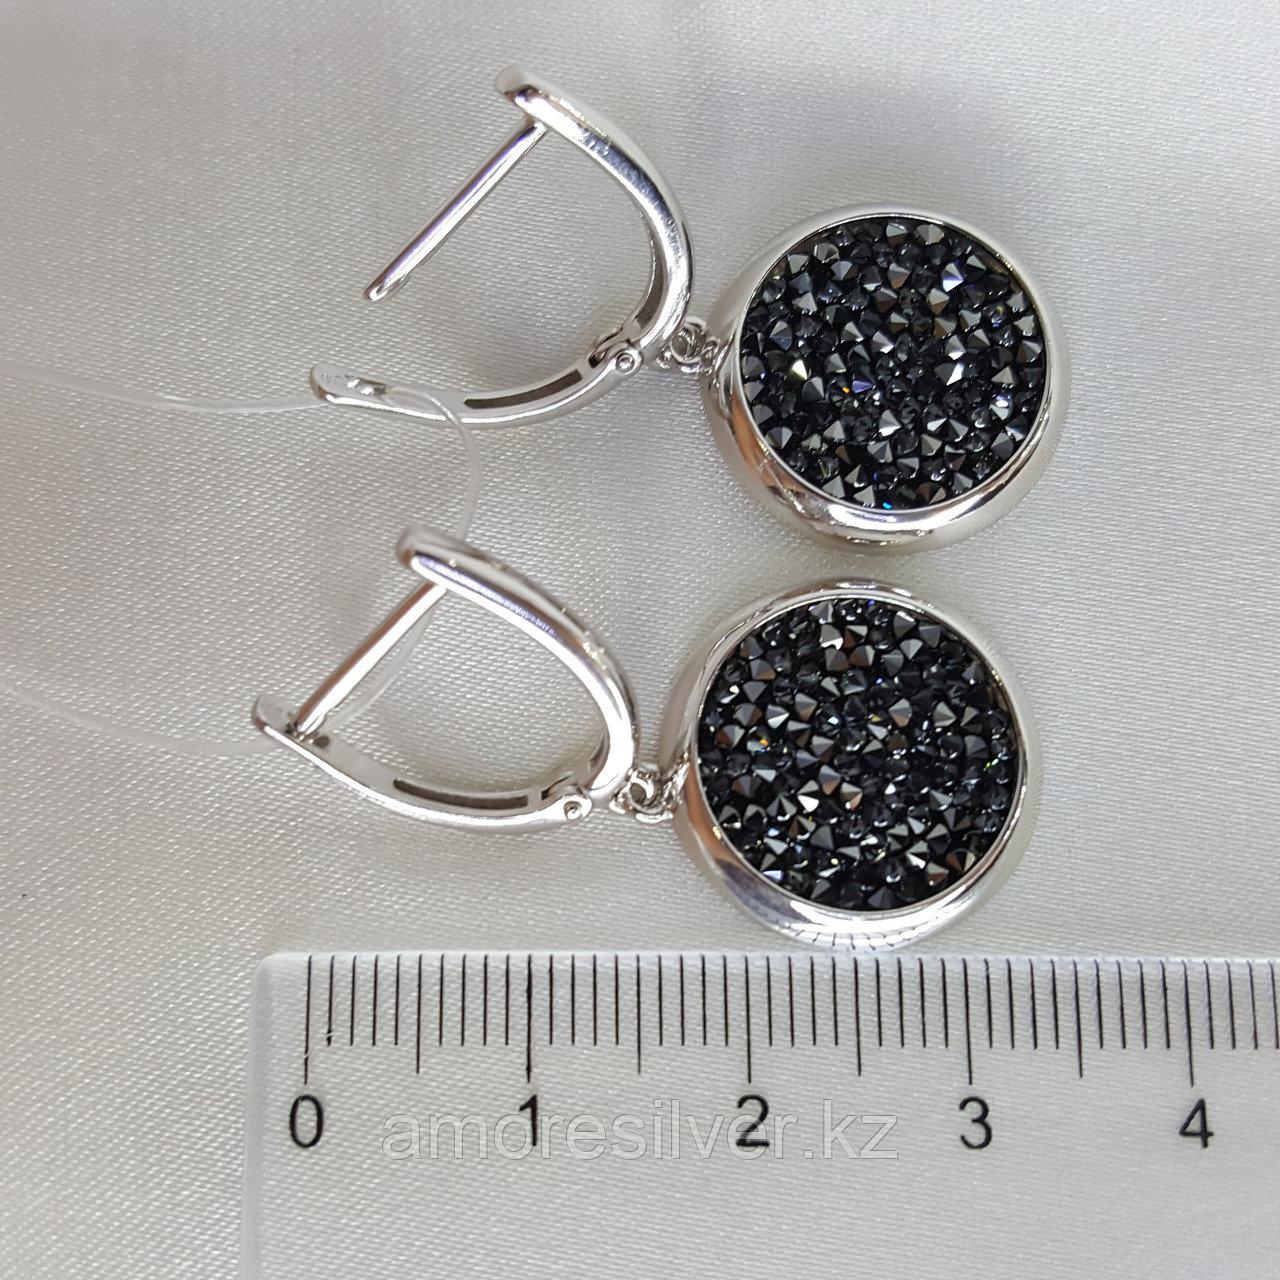 Серьги SOKOLOV серебро с родием, кристалл swarovski fine rocks , многокаменка 94022683 - фото 9